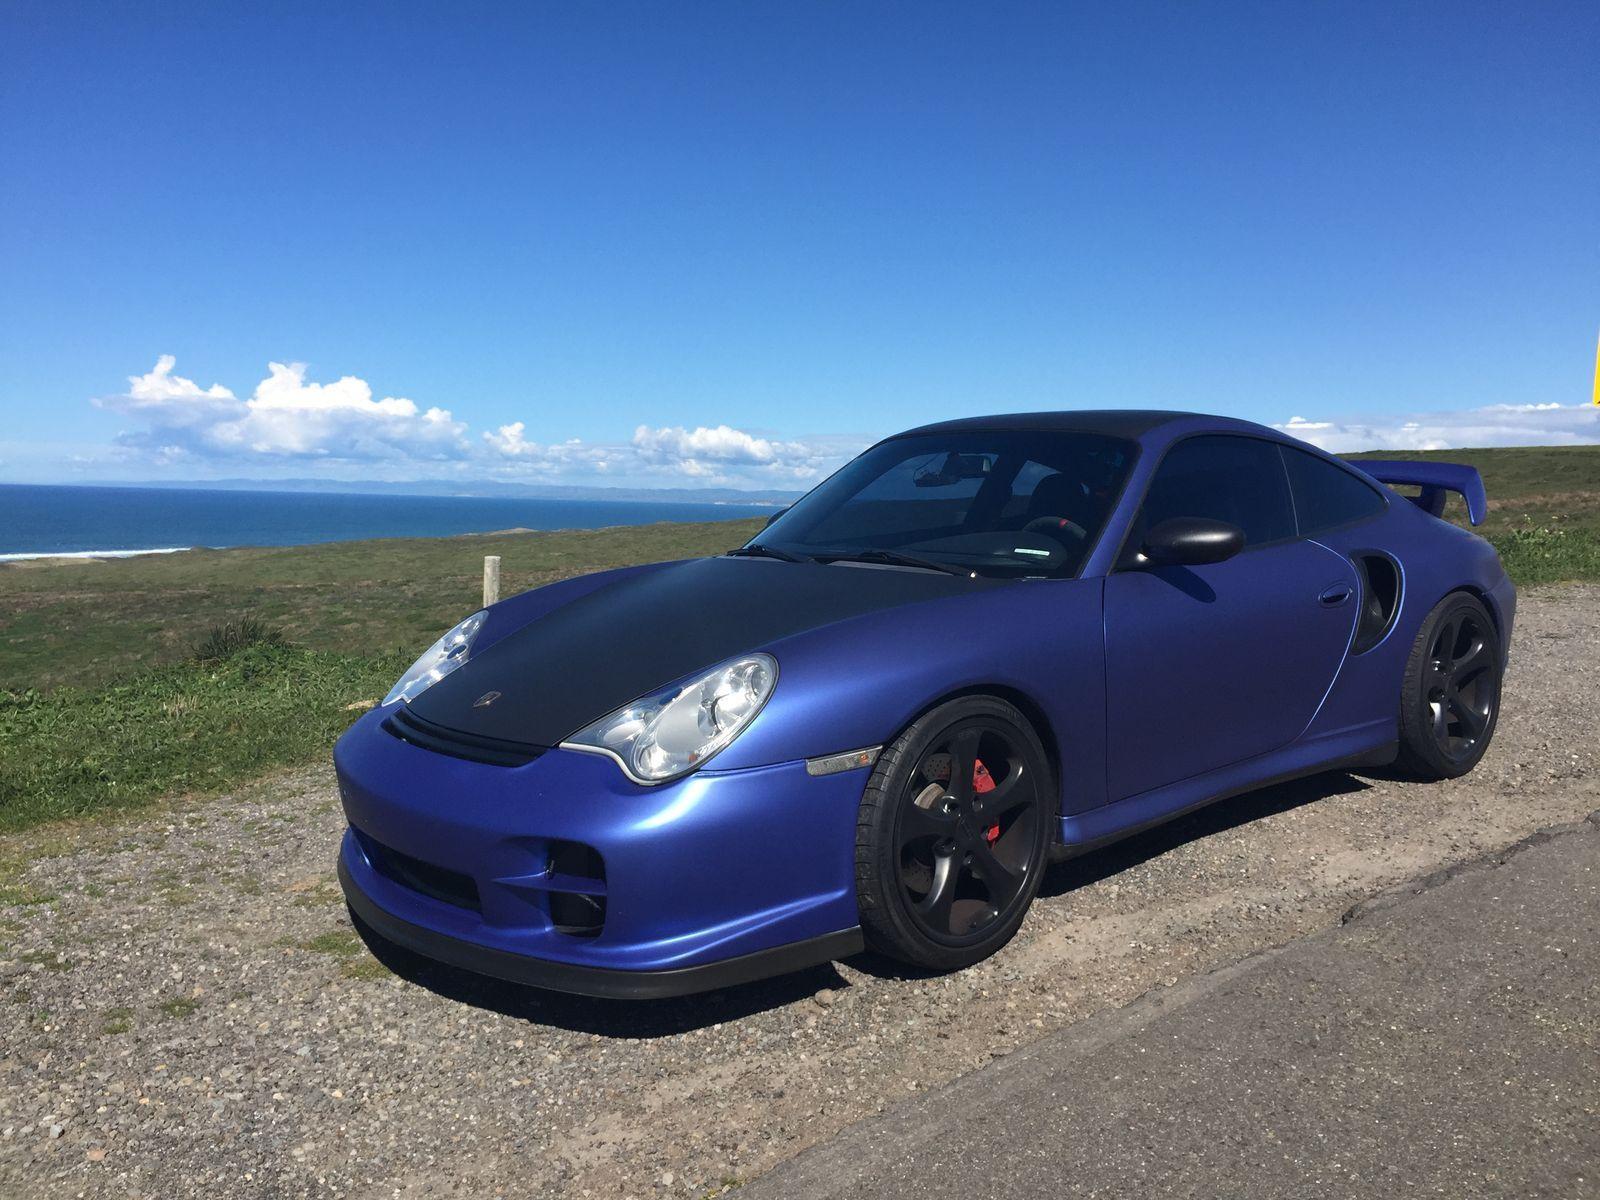 2001 Porsche 911 | Porsche 911 Turbo Matte Blue